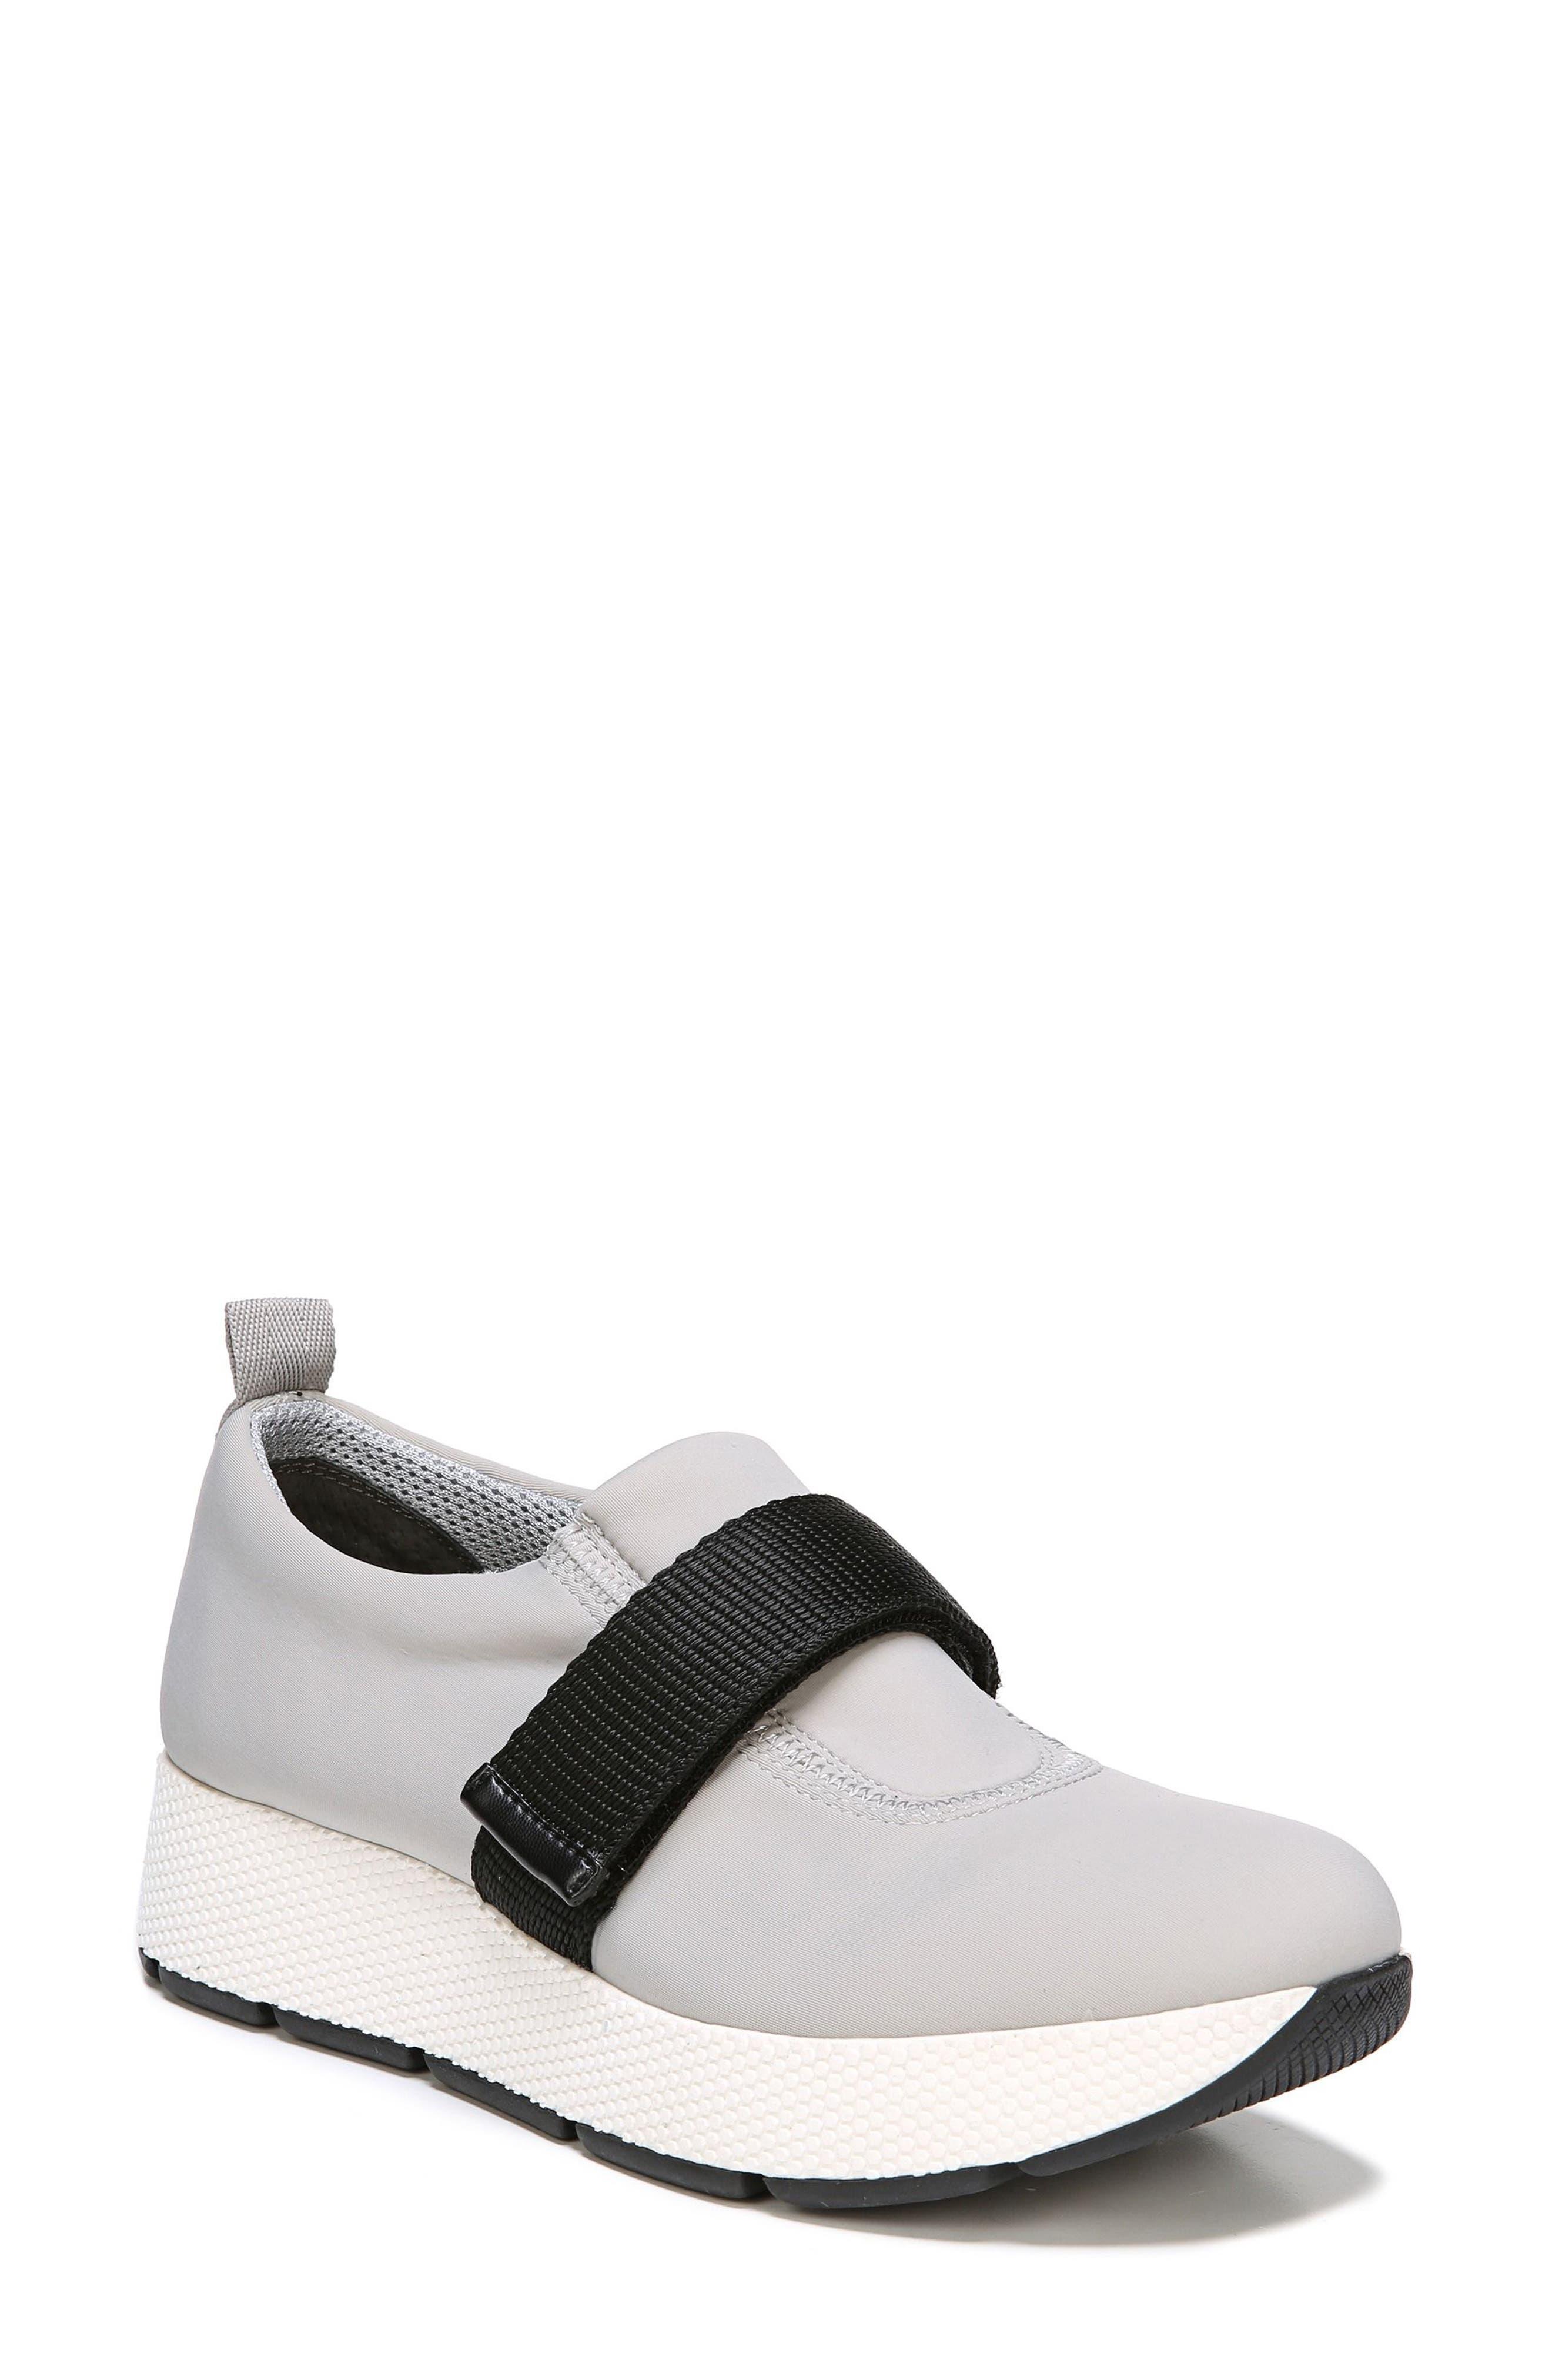 Odella Slip-On Sneaker,                             Main thumbnail 1, color,                             Light Grey Fabric